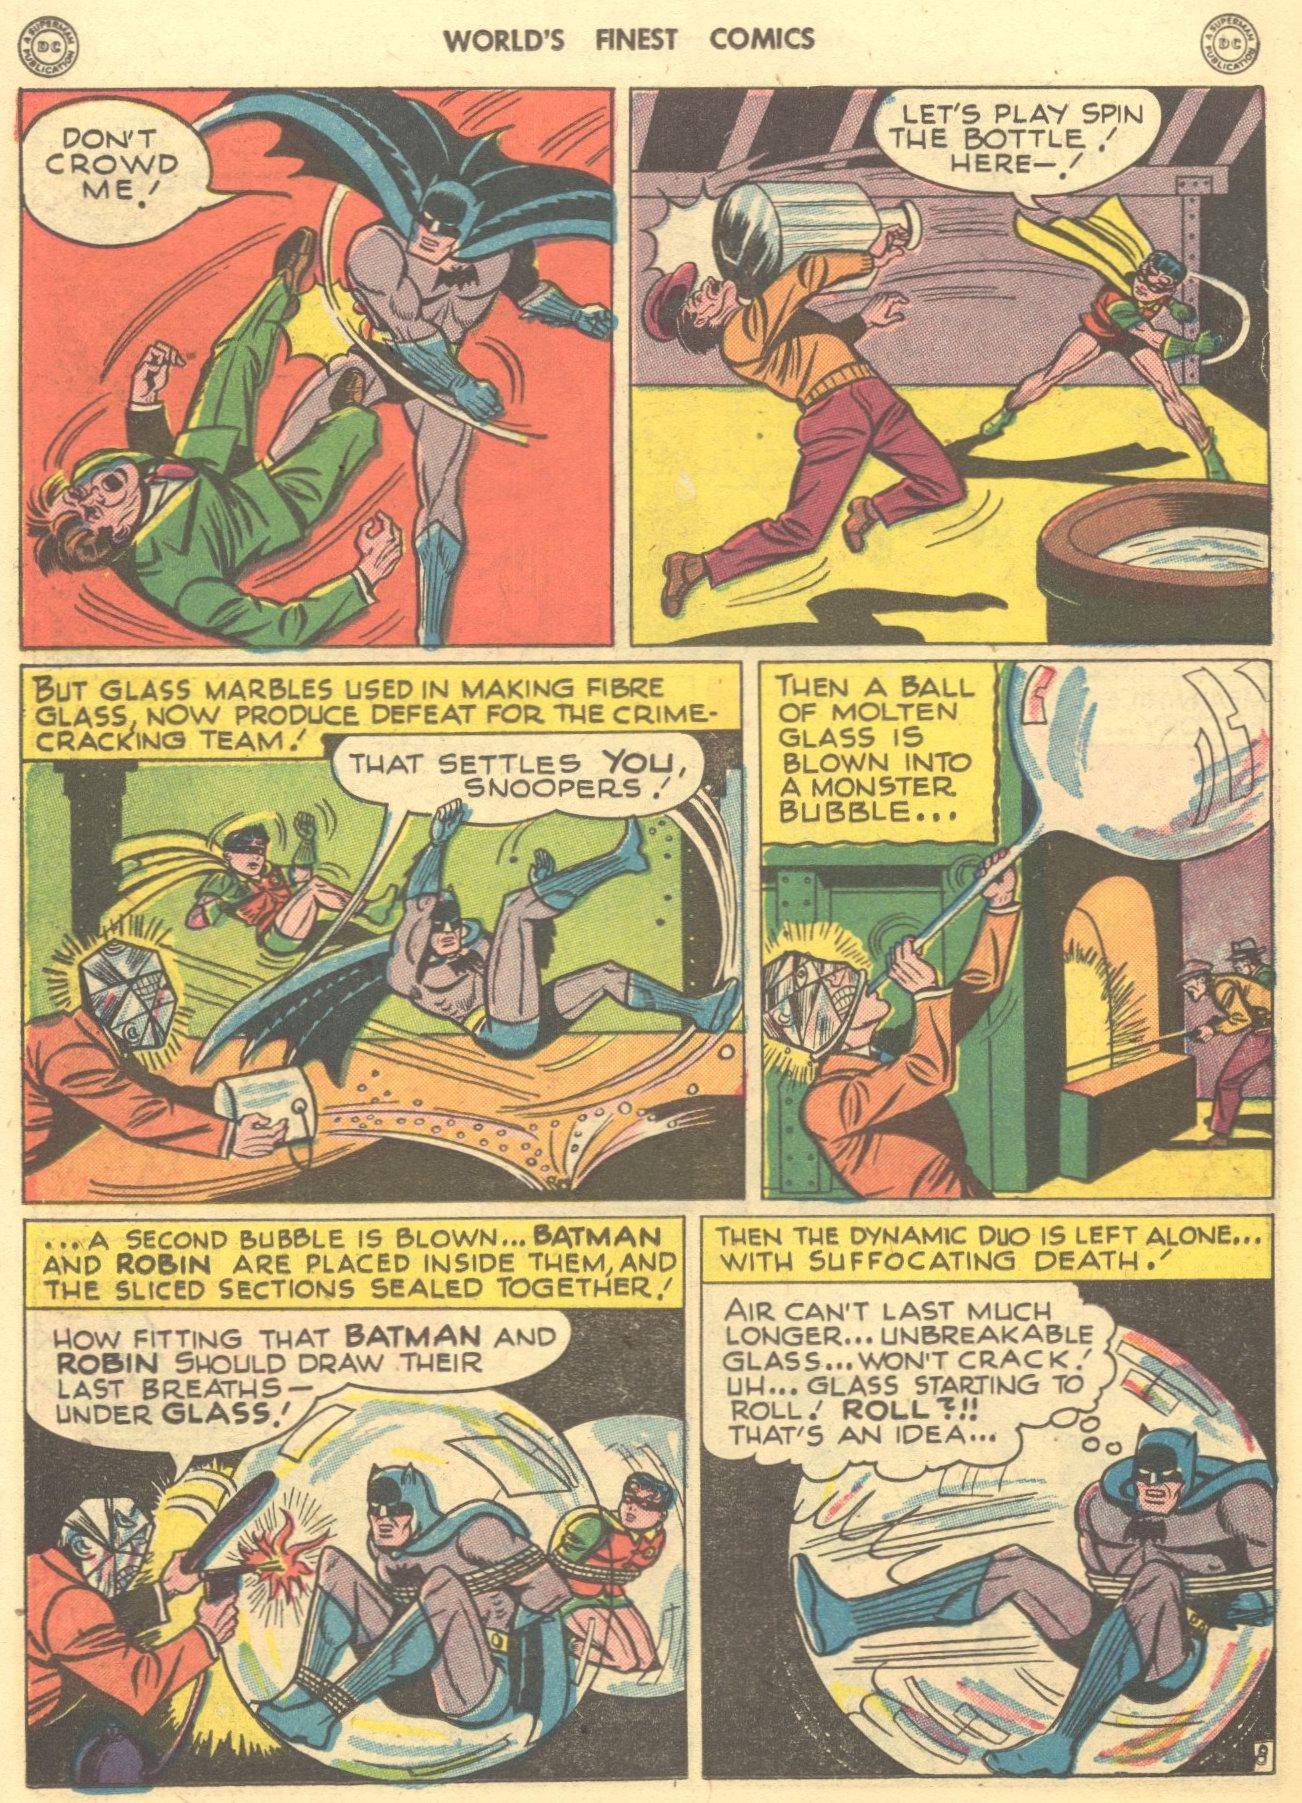 Read online World's Finest Comics comic -  Issue #28 - 67